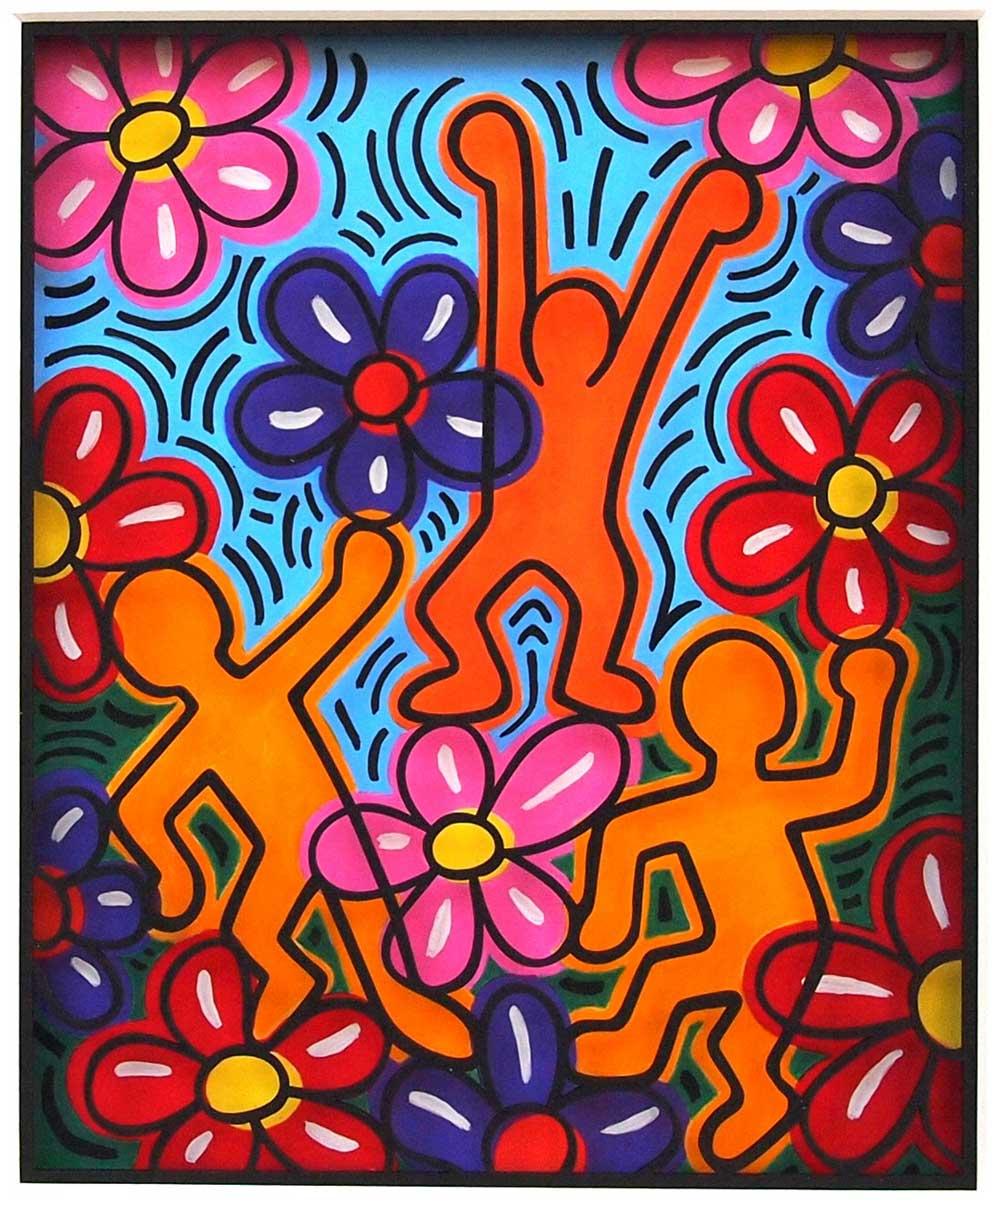 Volker Kühn - The-Garden-of-Keith-Haring - Art in Boxes